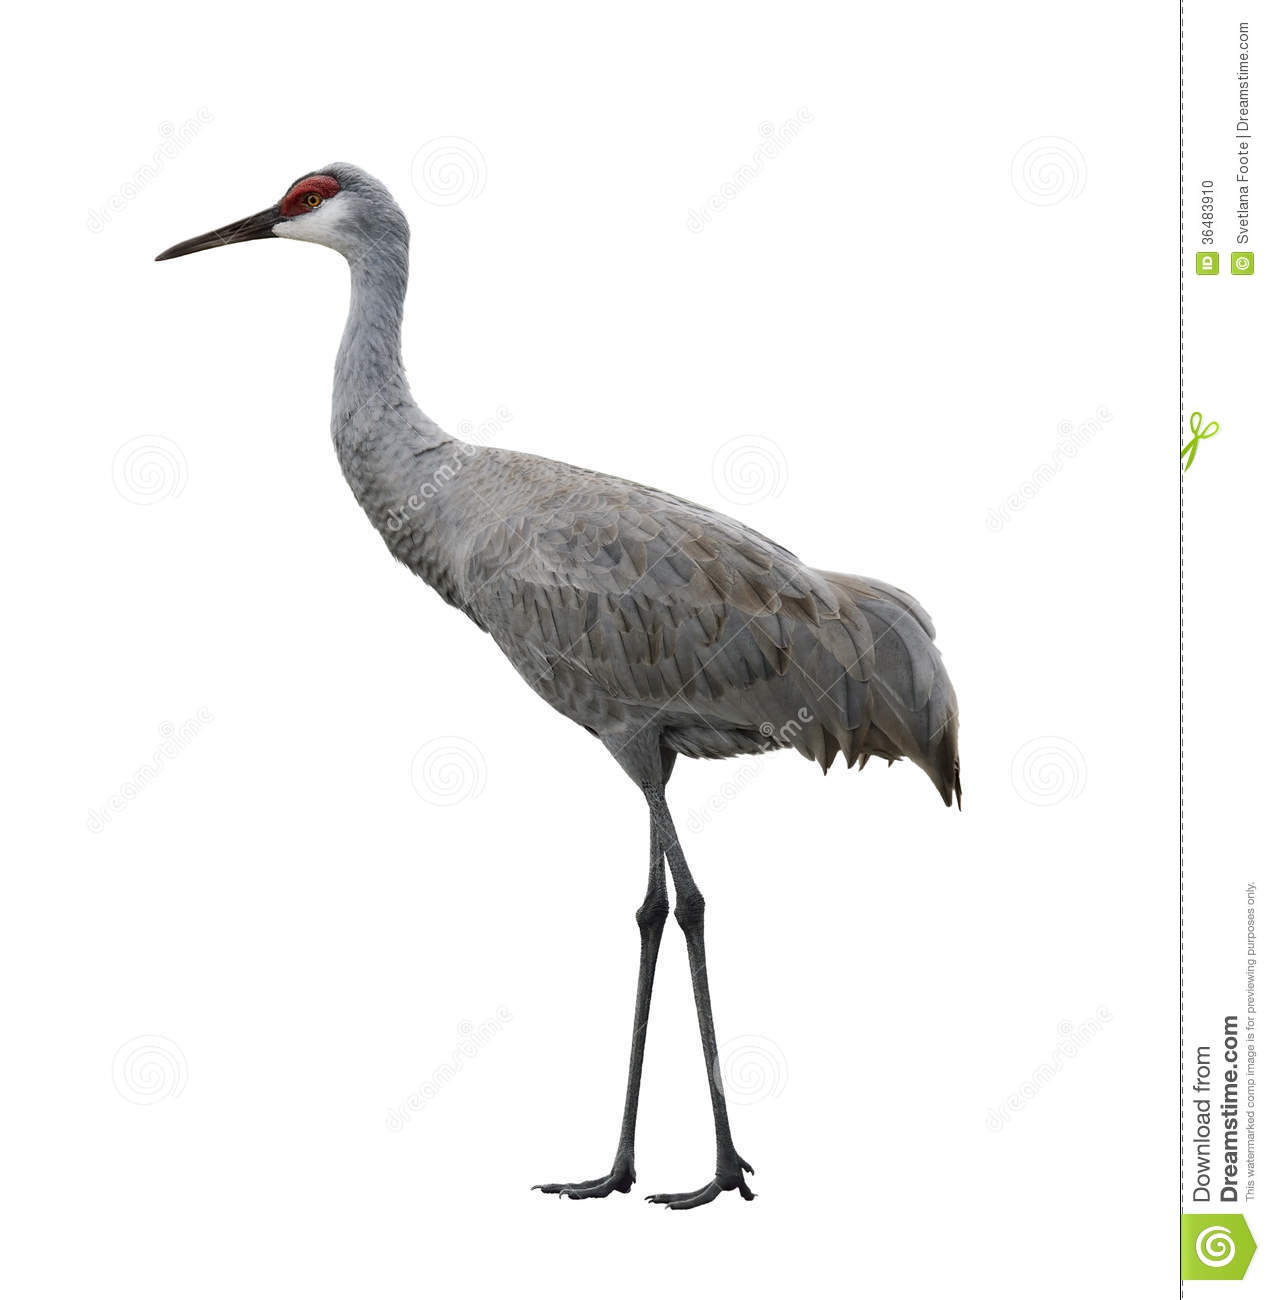 Crane Bird Stock Photos, Images, & Pictures.